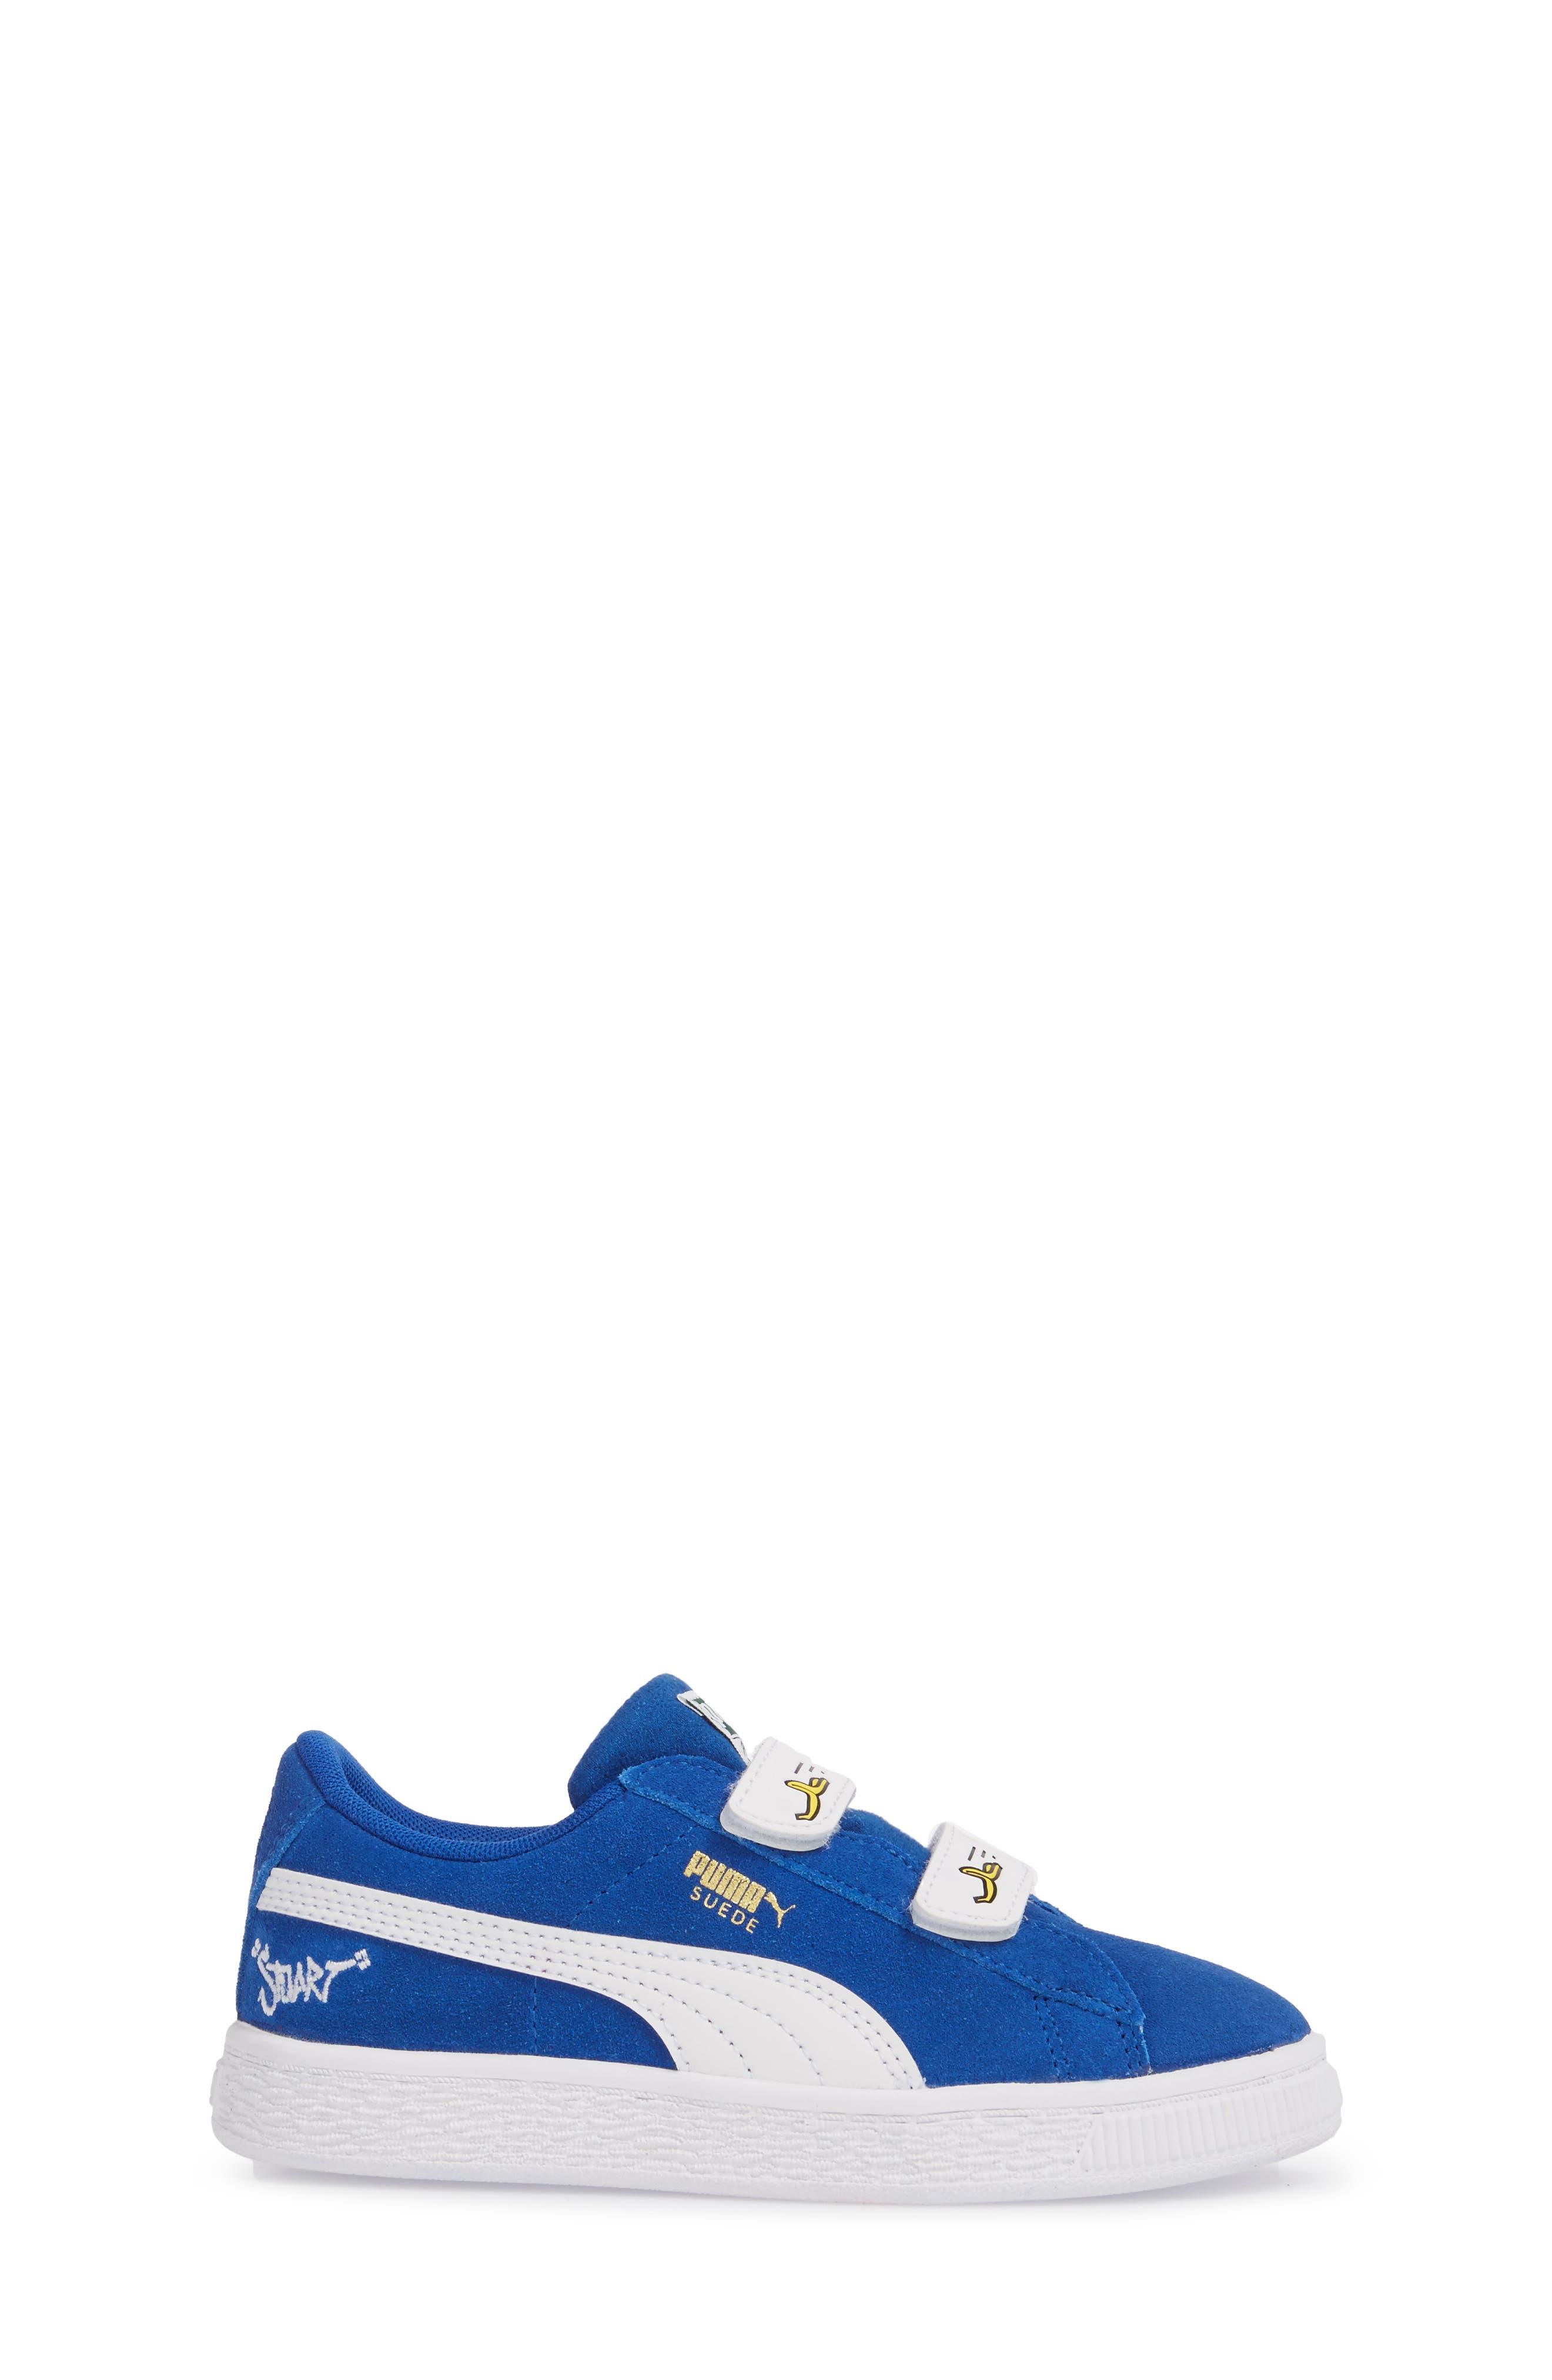 x Minions Suede V Sneaker,                             Alternate thumbnail 3, color,                             Olympian Blue/ Puma White